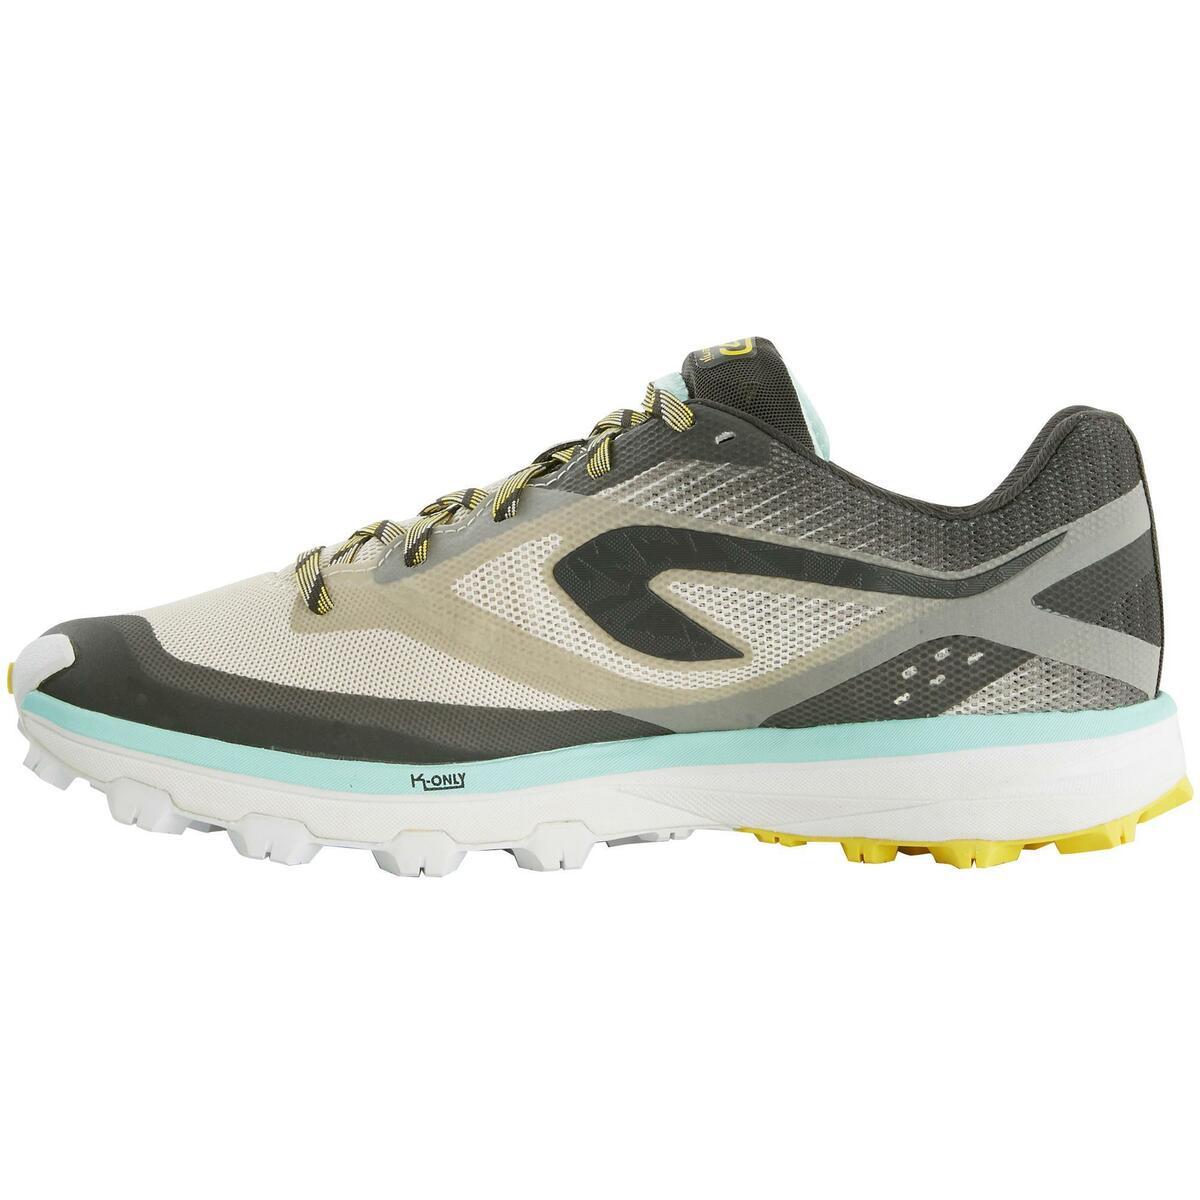 Bild 3 von Laufschuhe Trail Kiprun Race 4 Damen grau/gelb